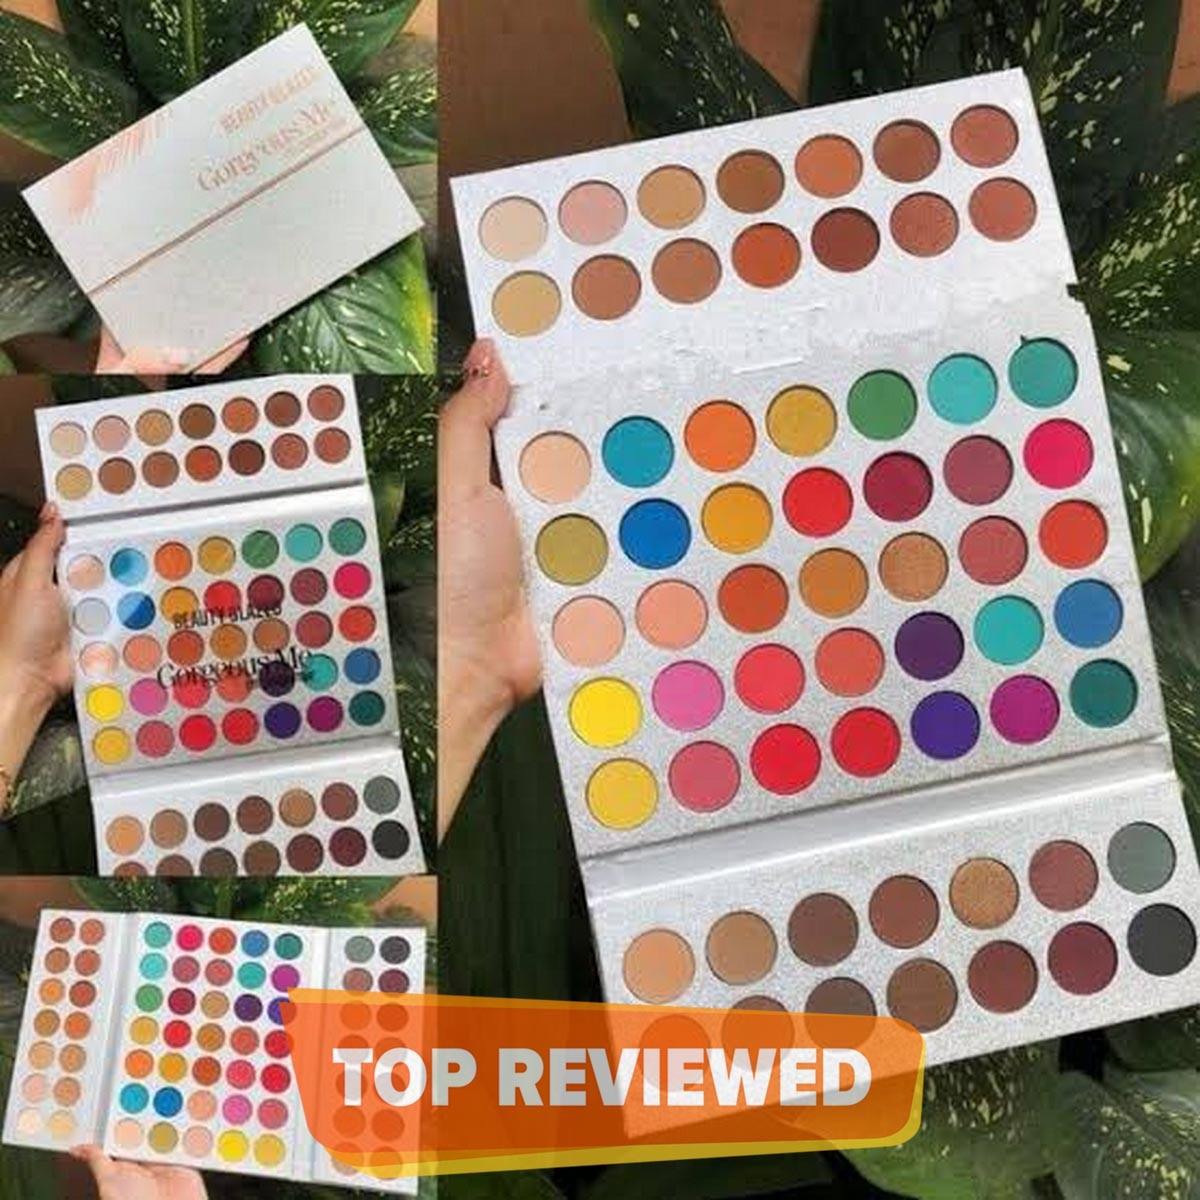 Beauty Glazed 63 Colors Pearlescent Matte Eyeshadow, Eye Cosmetics, Makeup Palette, 3 Folding Palette